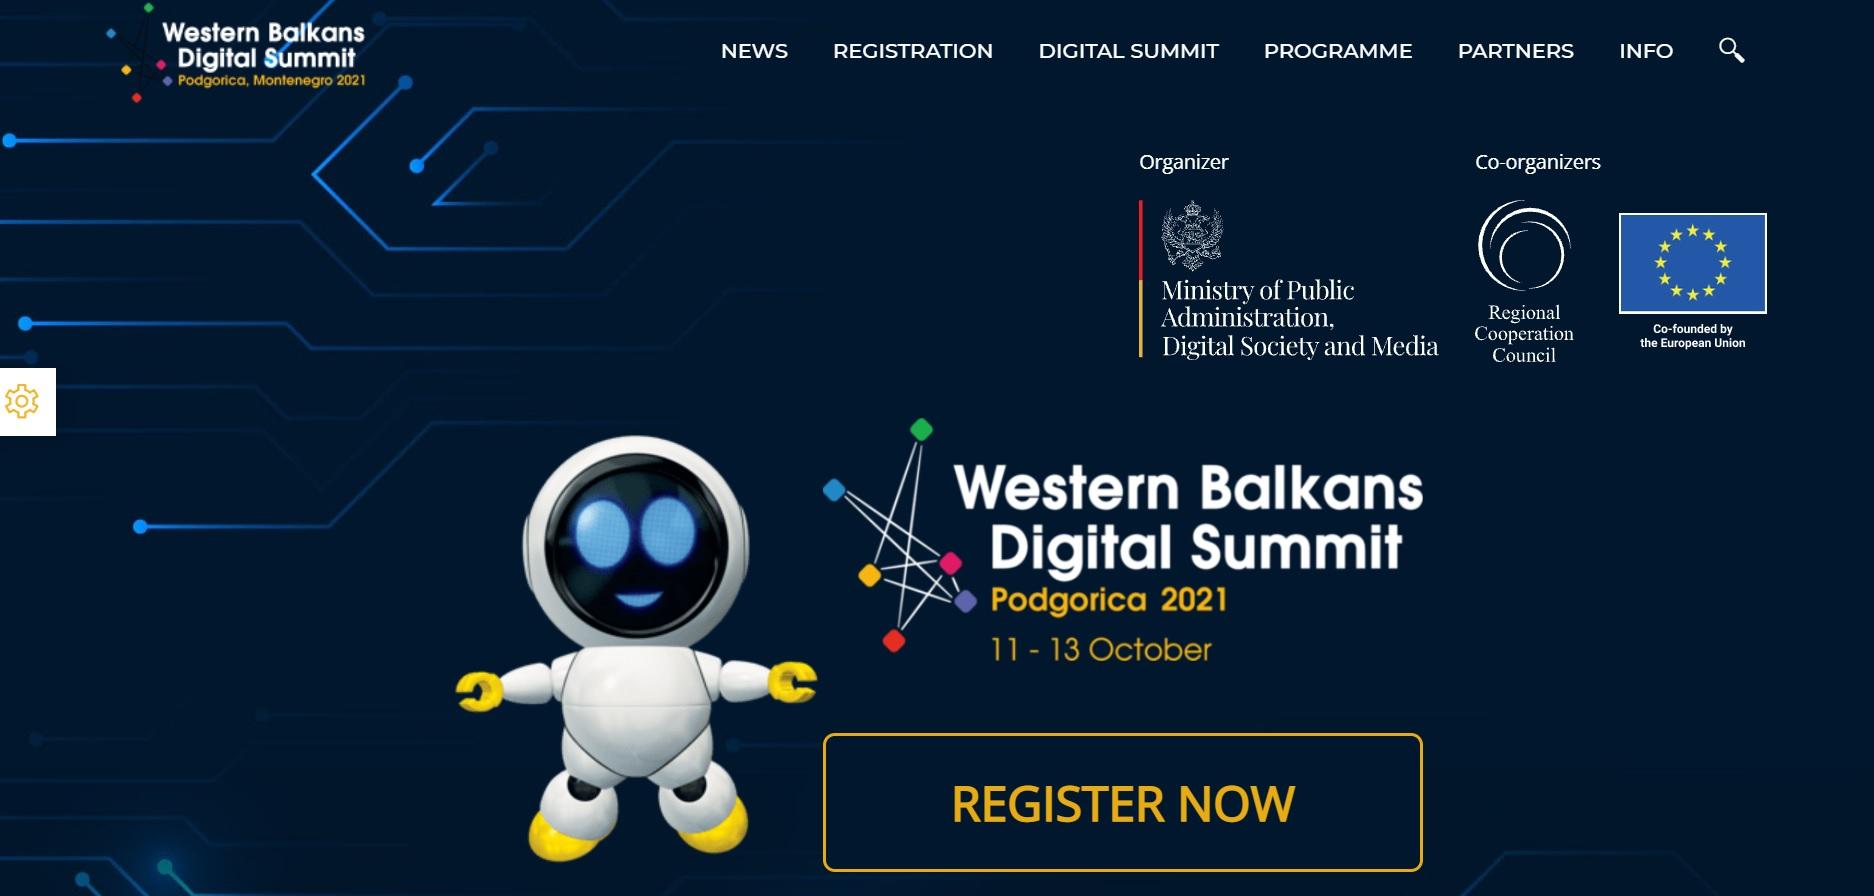 Western Balkans Digital Summit 2021